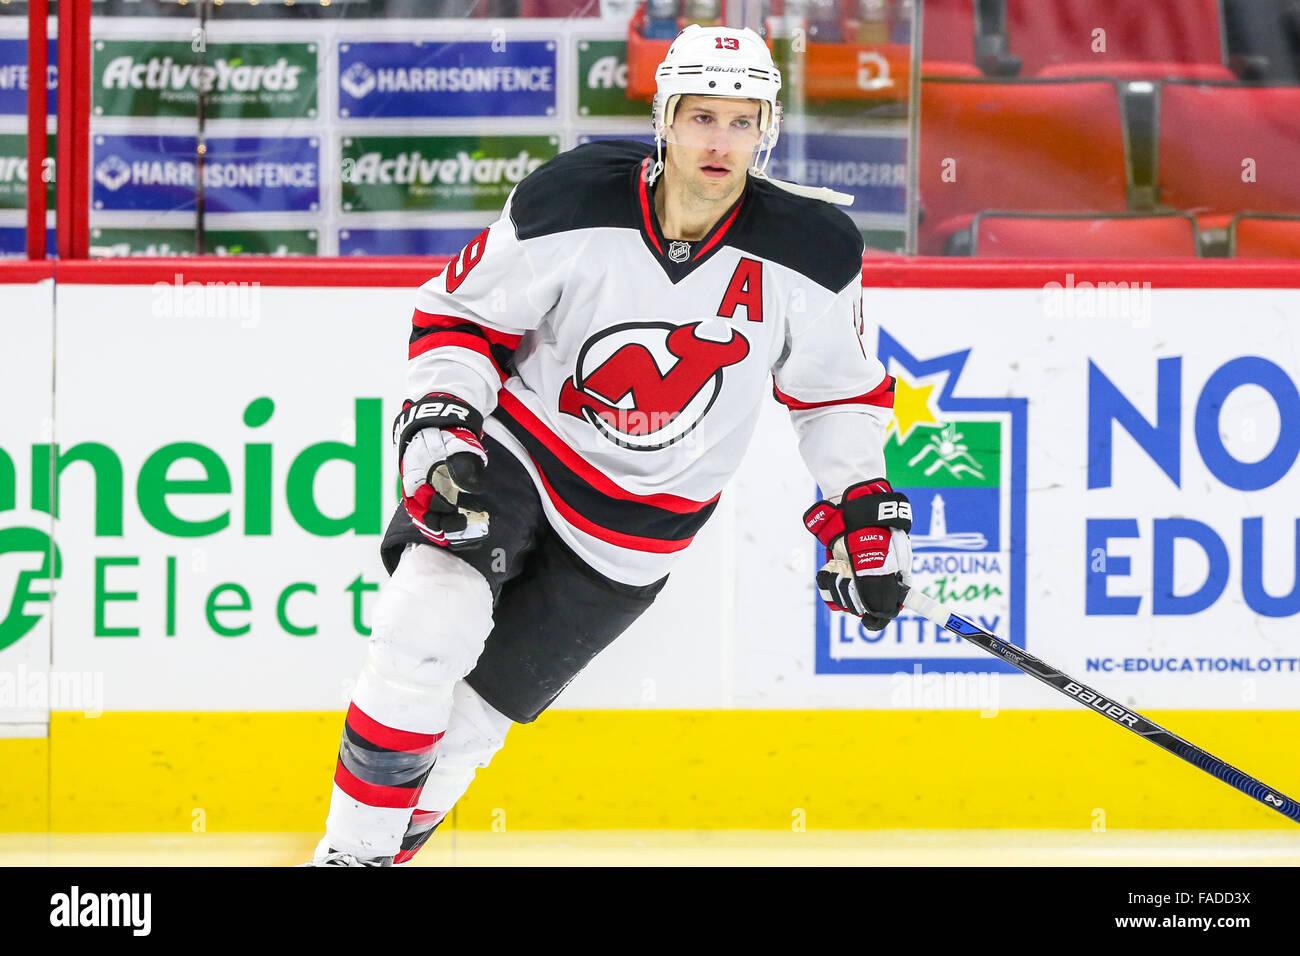 hot sale online 57baf 9e7d6 New Jersey Devils center Travis Zajac (19) during the NHL ...